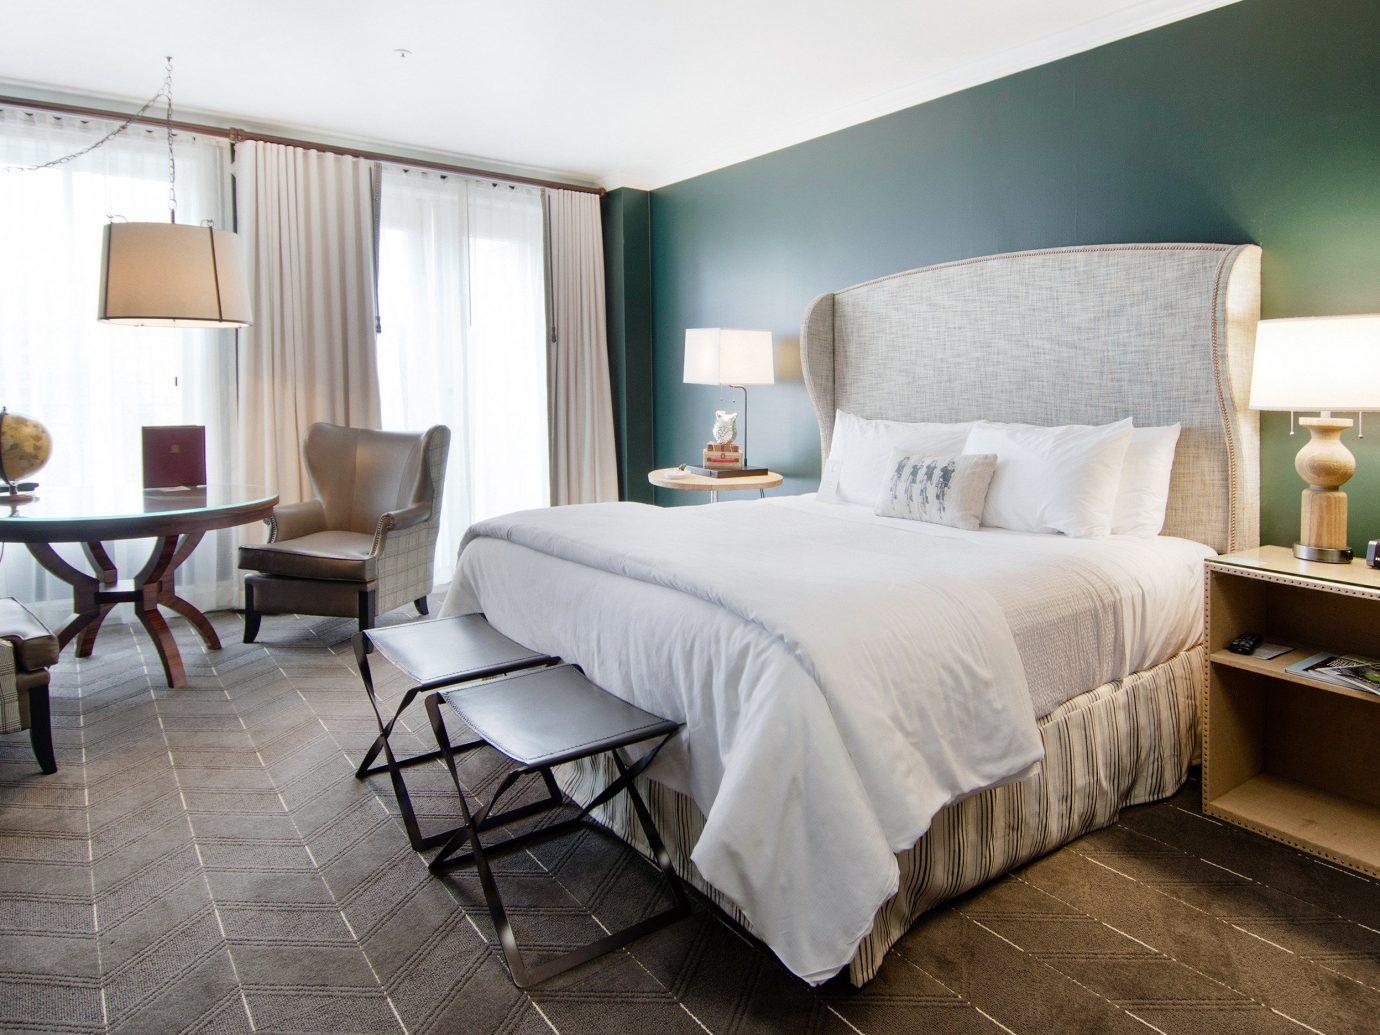 Boutique Hotels Hotels Luxury Travel floor indoor bed wall room Bedroom hotel Suite bed frame ceiling interior design green real estate furniture interior designer flooring